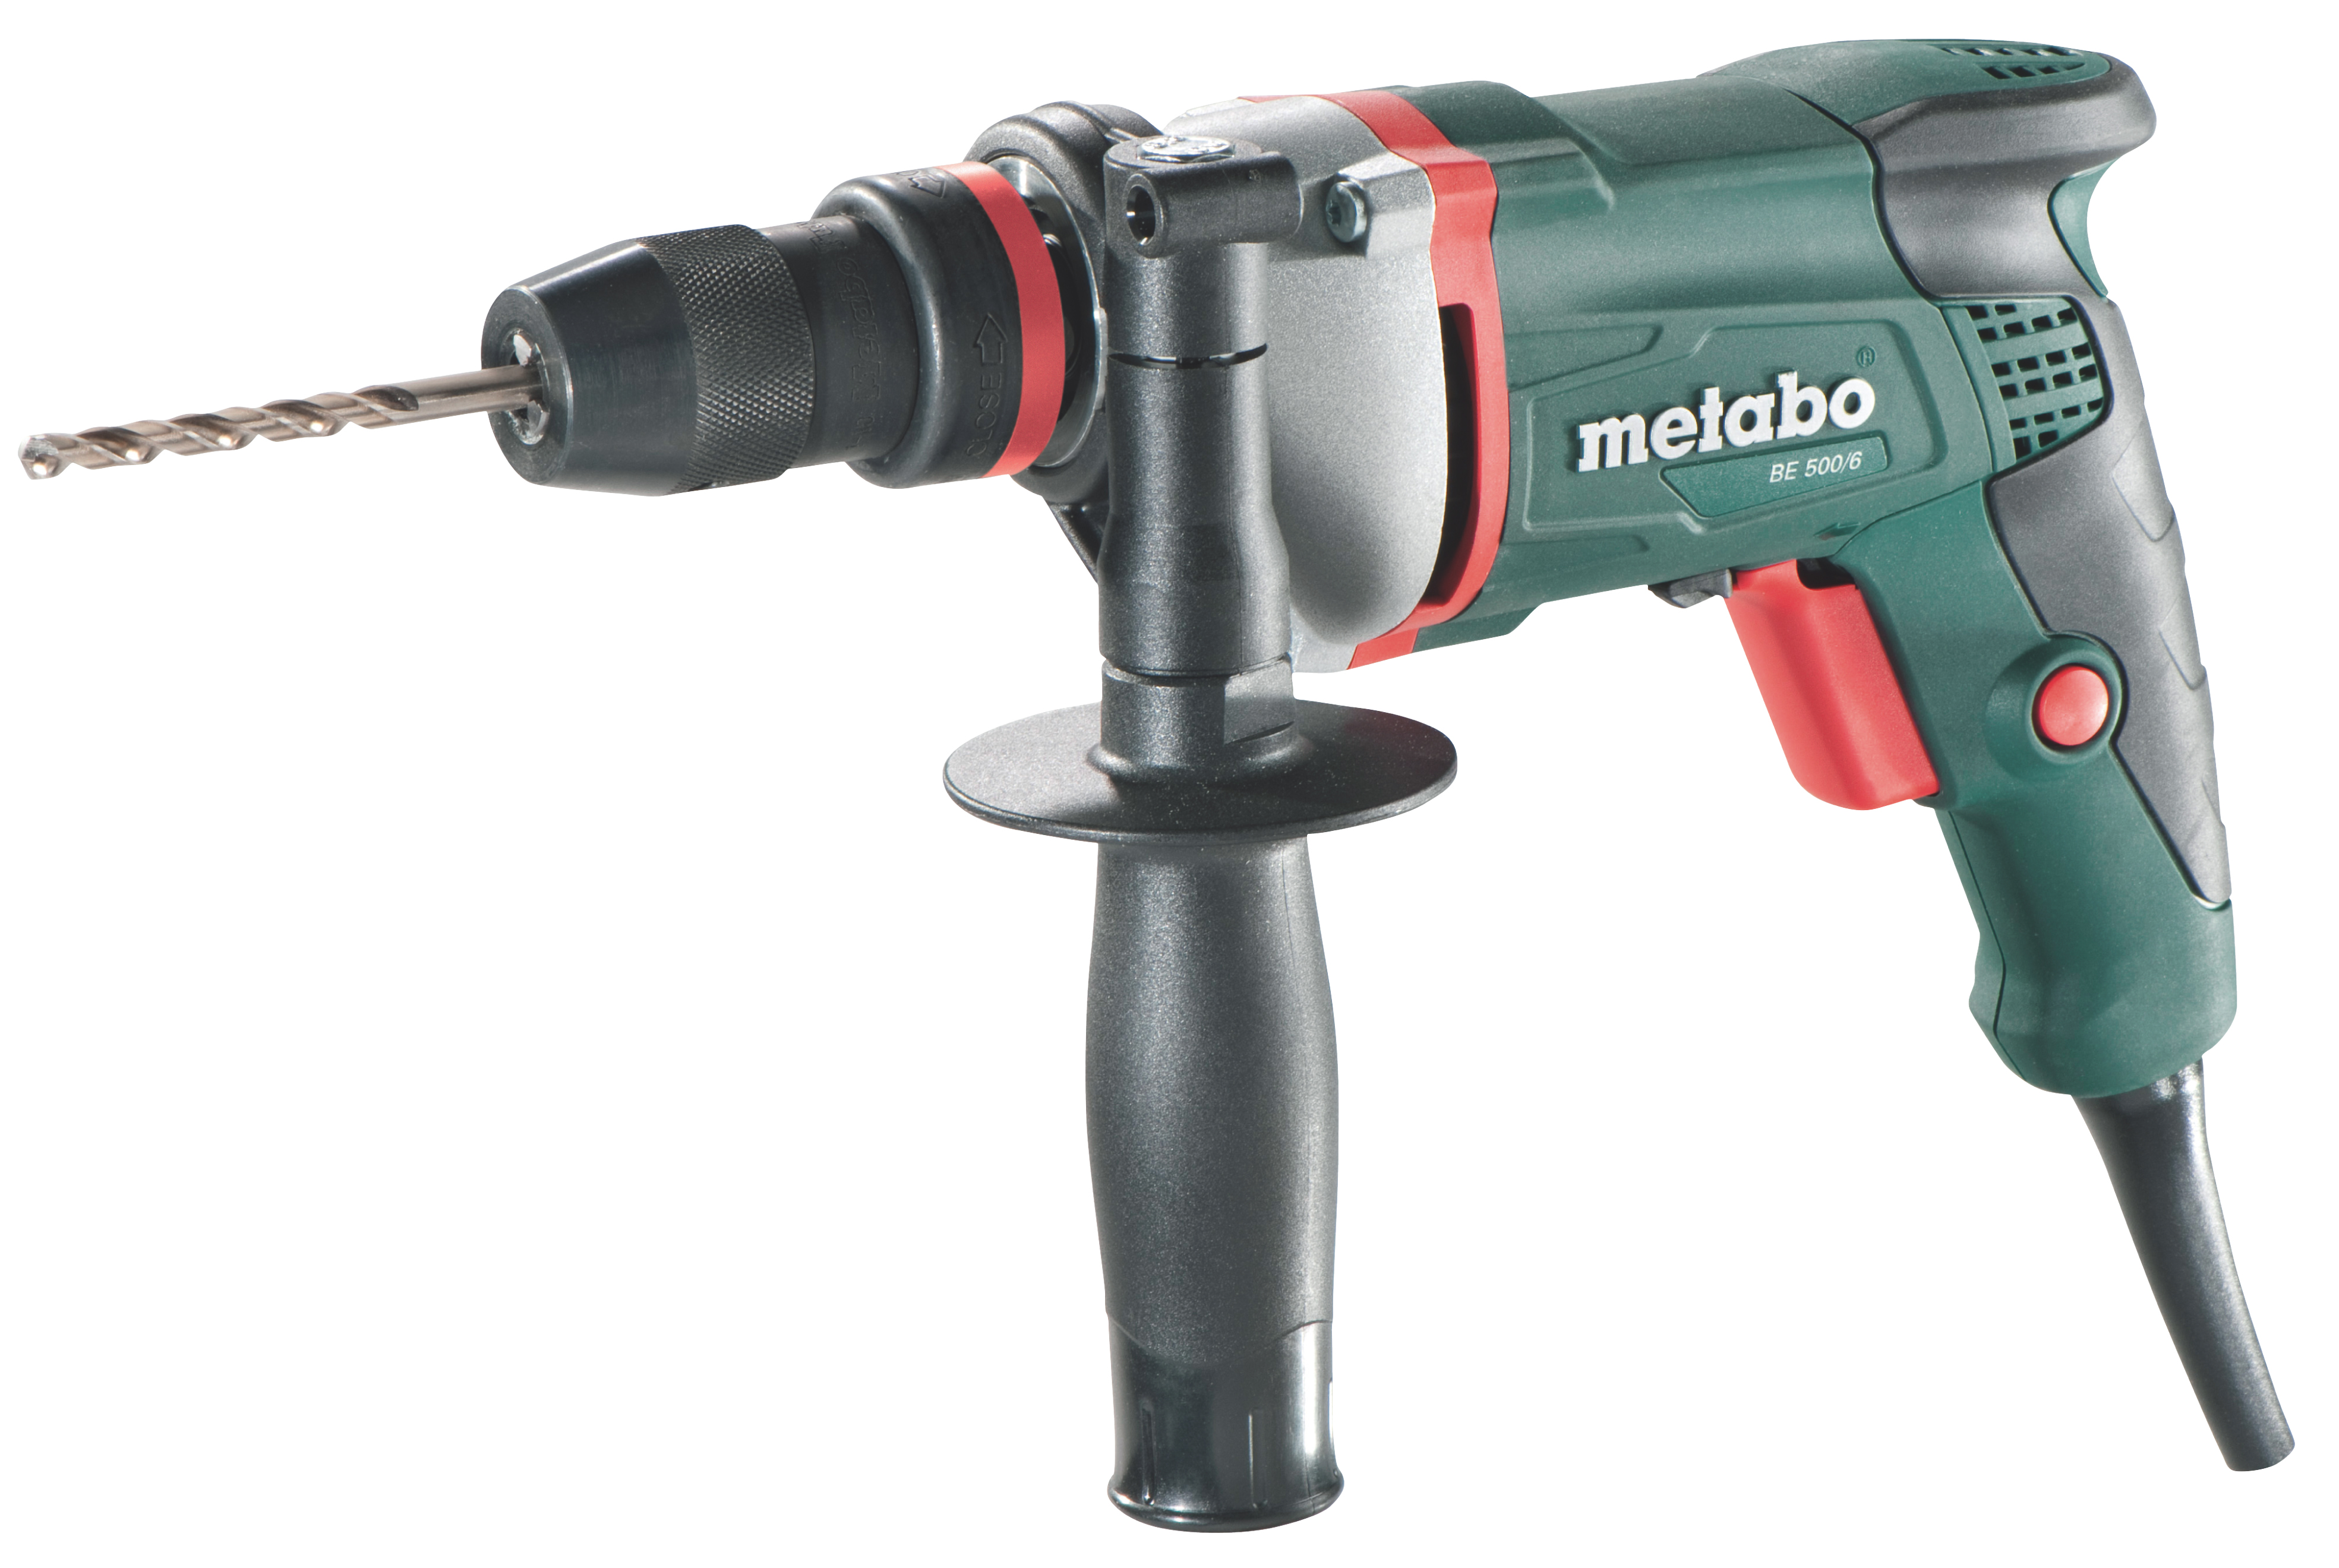 Дрель Metabo Be500/6 (600343000) дрель шуруповерт metabo be 6 звп